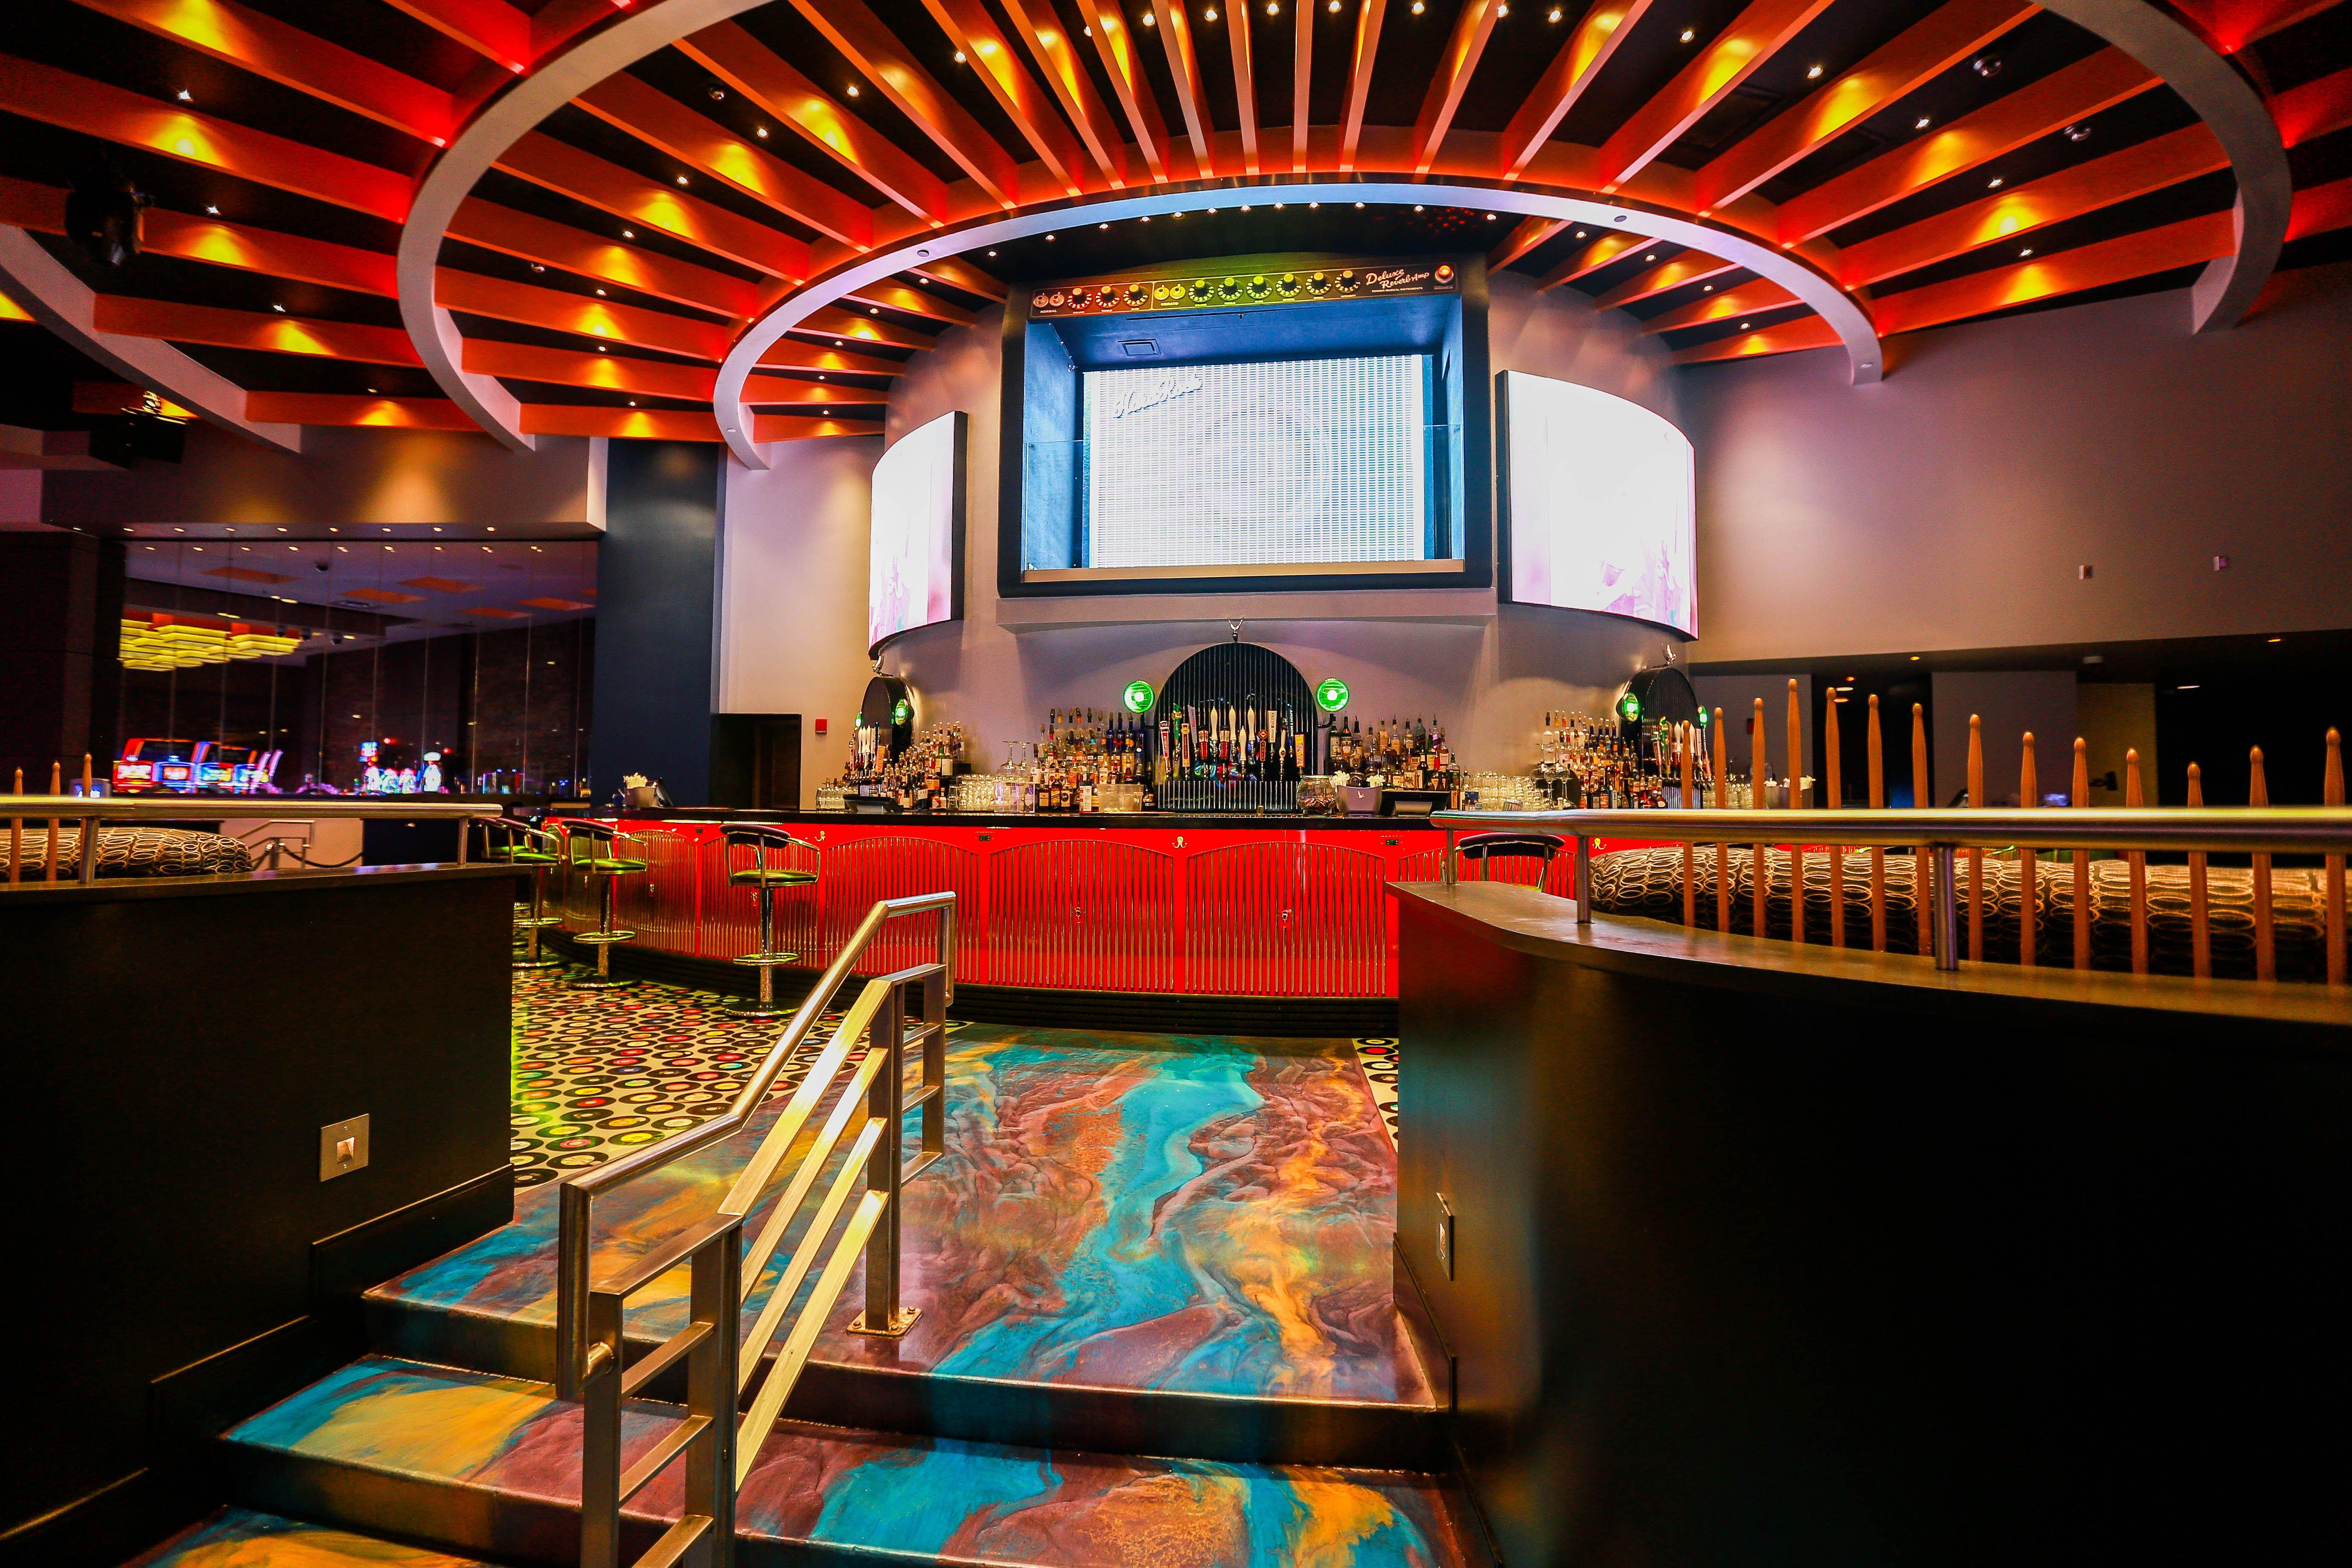 Hard rock casino bar tulsa family feud 2 player game download